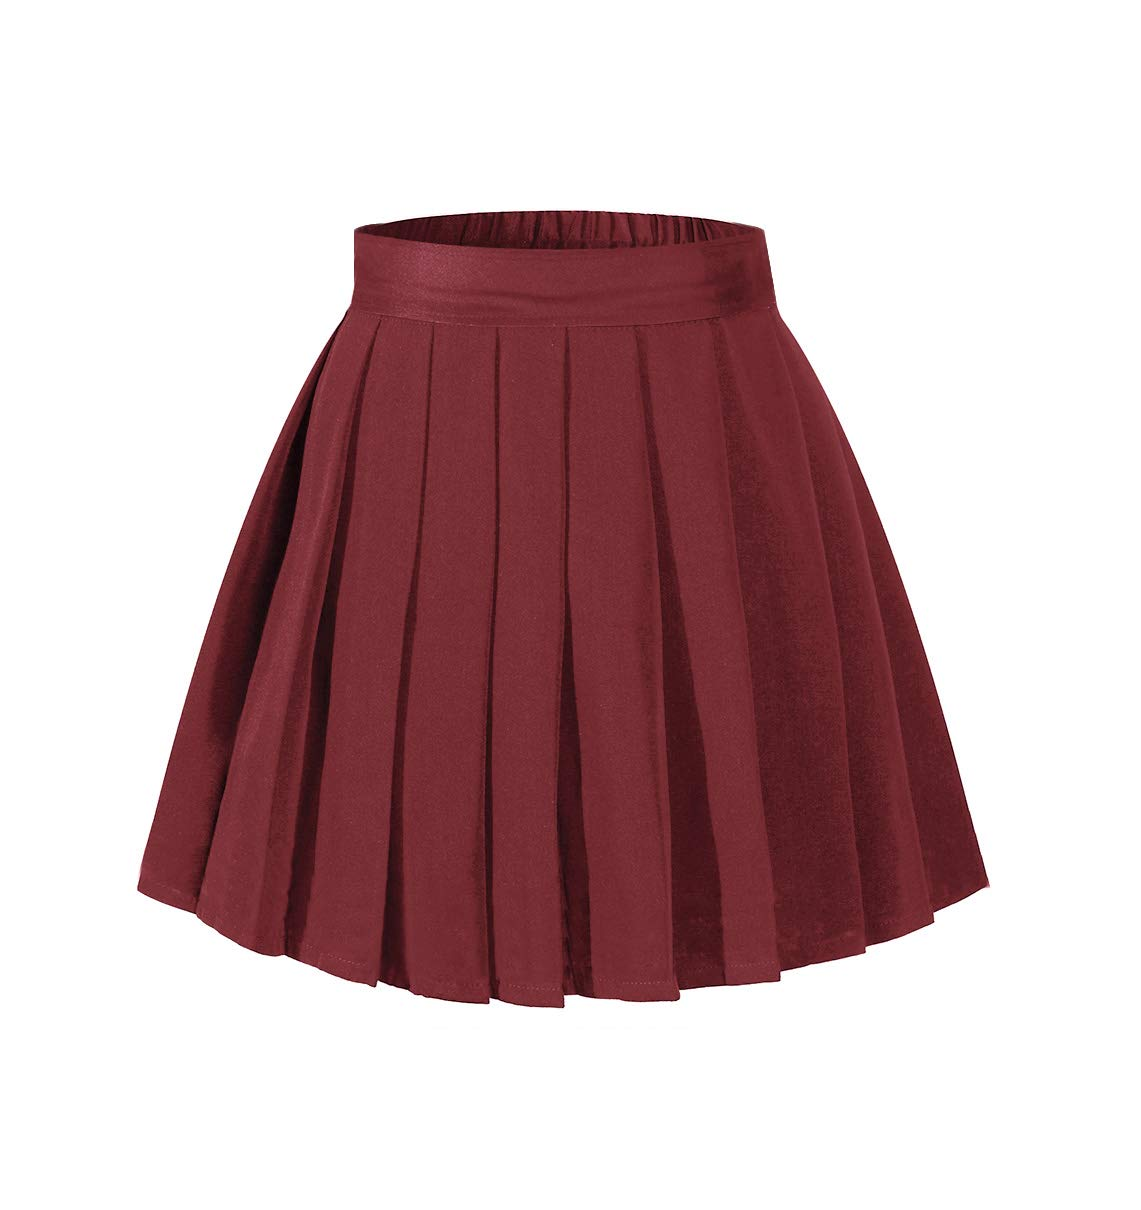 Beautifulfashionlife Women's High Waist Mini Skirt Tennis Elastic Shorts Wine Red,2XL by Beautifulfashionlife